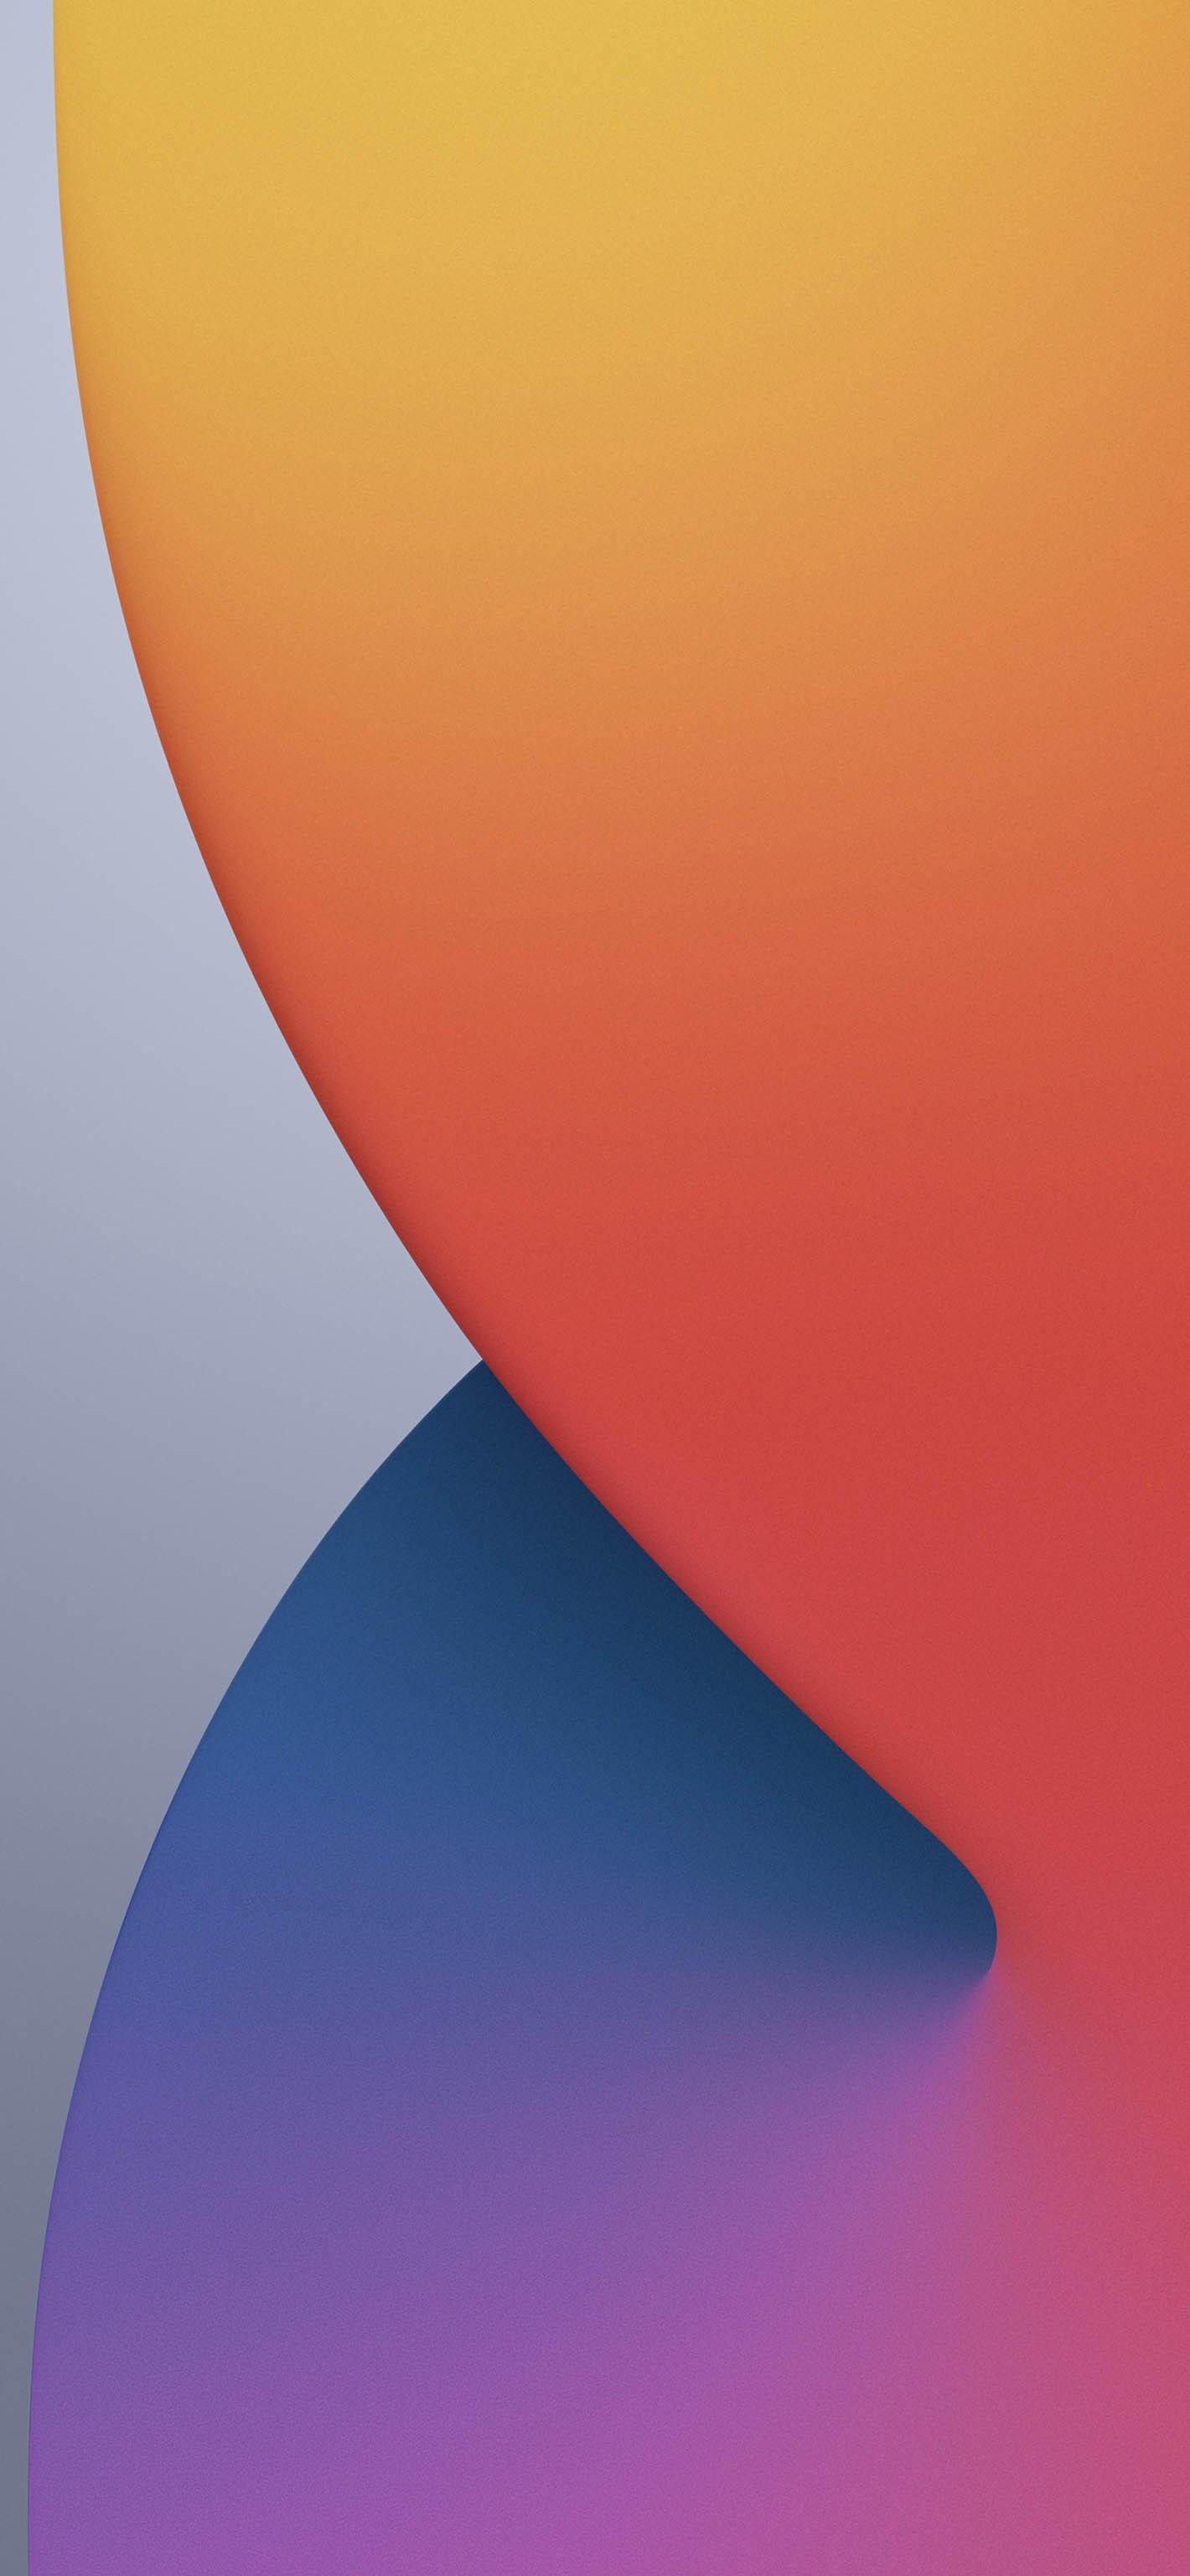 Fondo iOS 14 naranja y azul